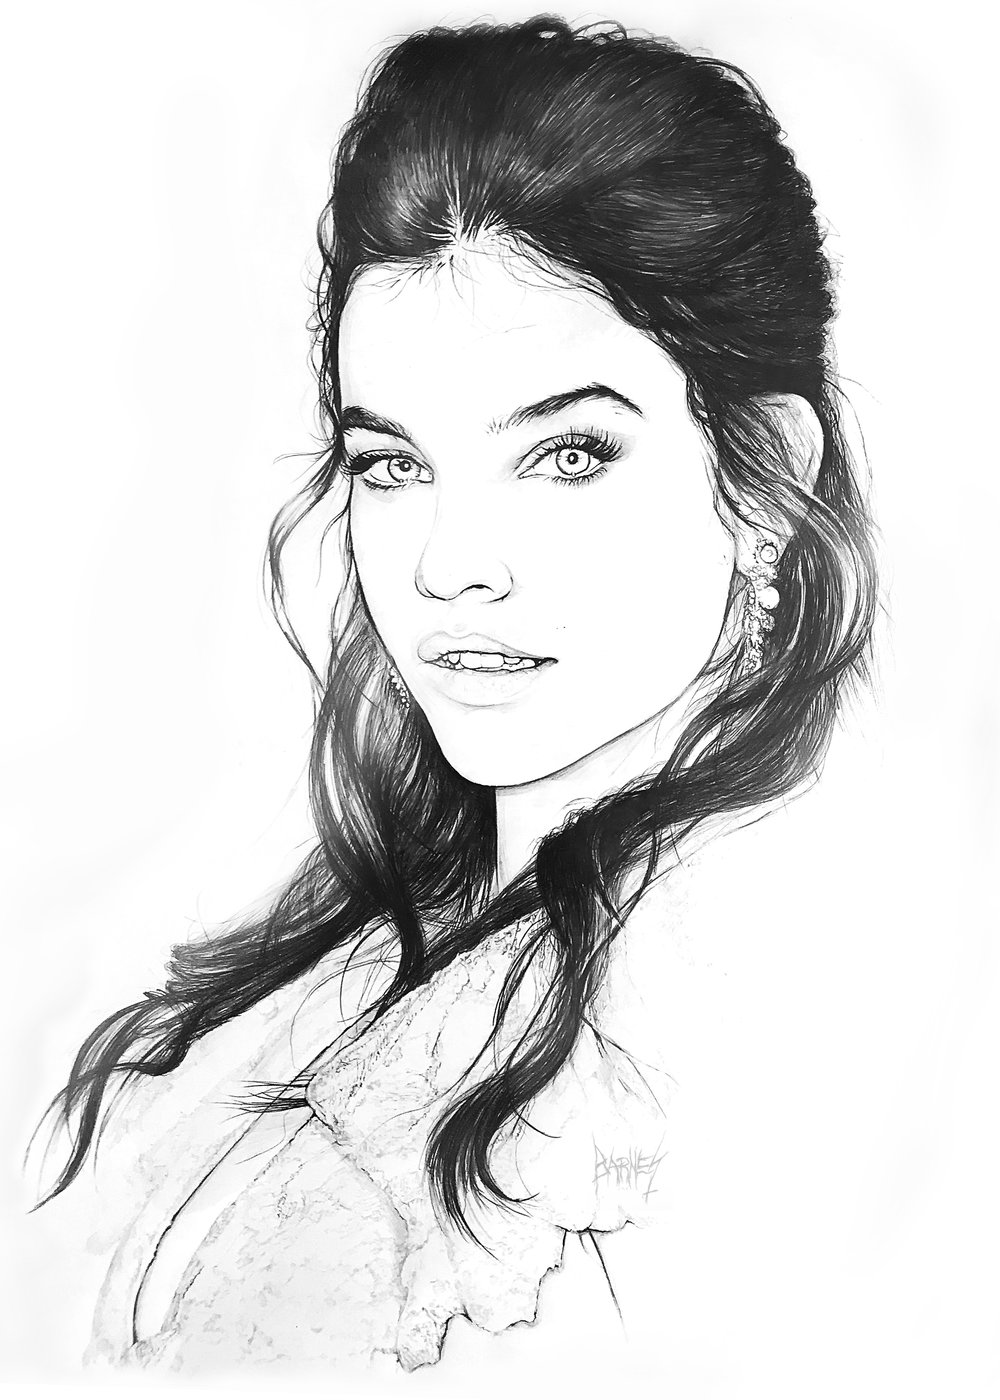 BBKUNST-Art-Artist-Bryan-Barnes-Pencil-Drawings-Art-beautiful-pretty-Drawing_Barbara_Palvin_artwork-fashion-model-Barbara-2-final.jpg